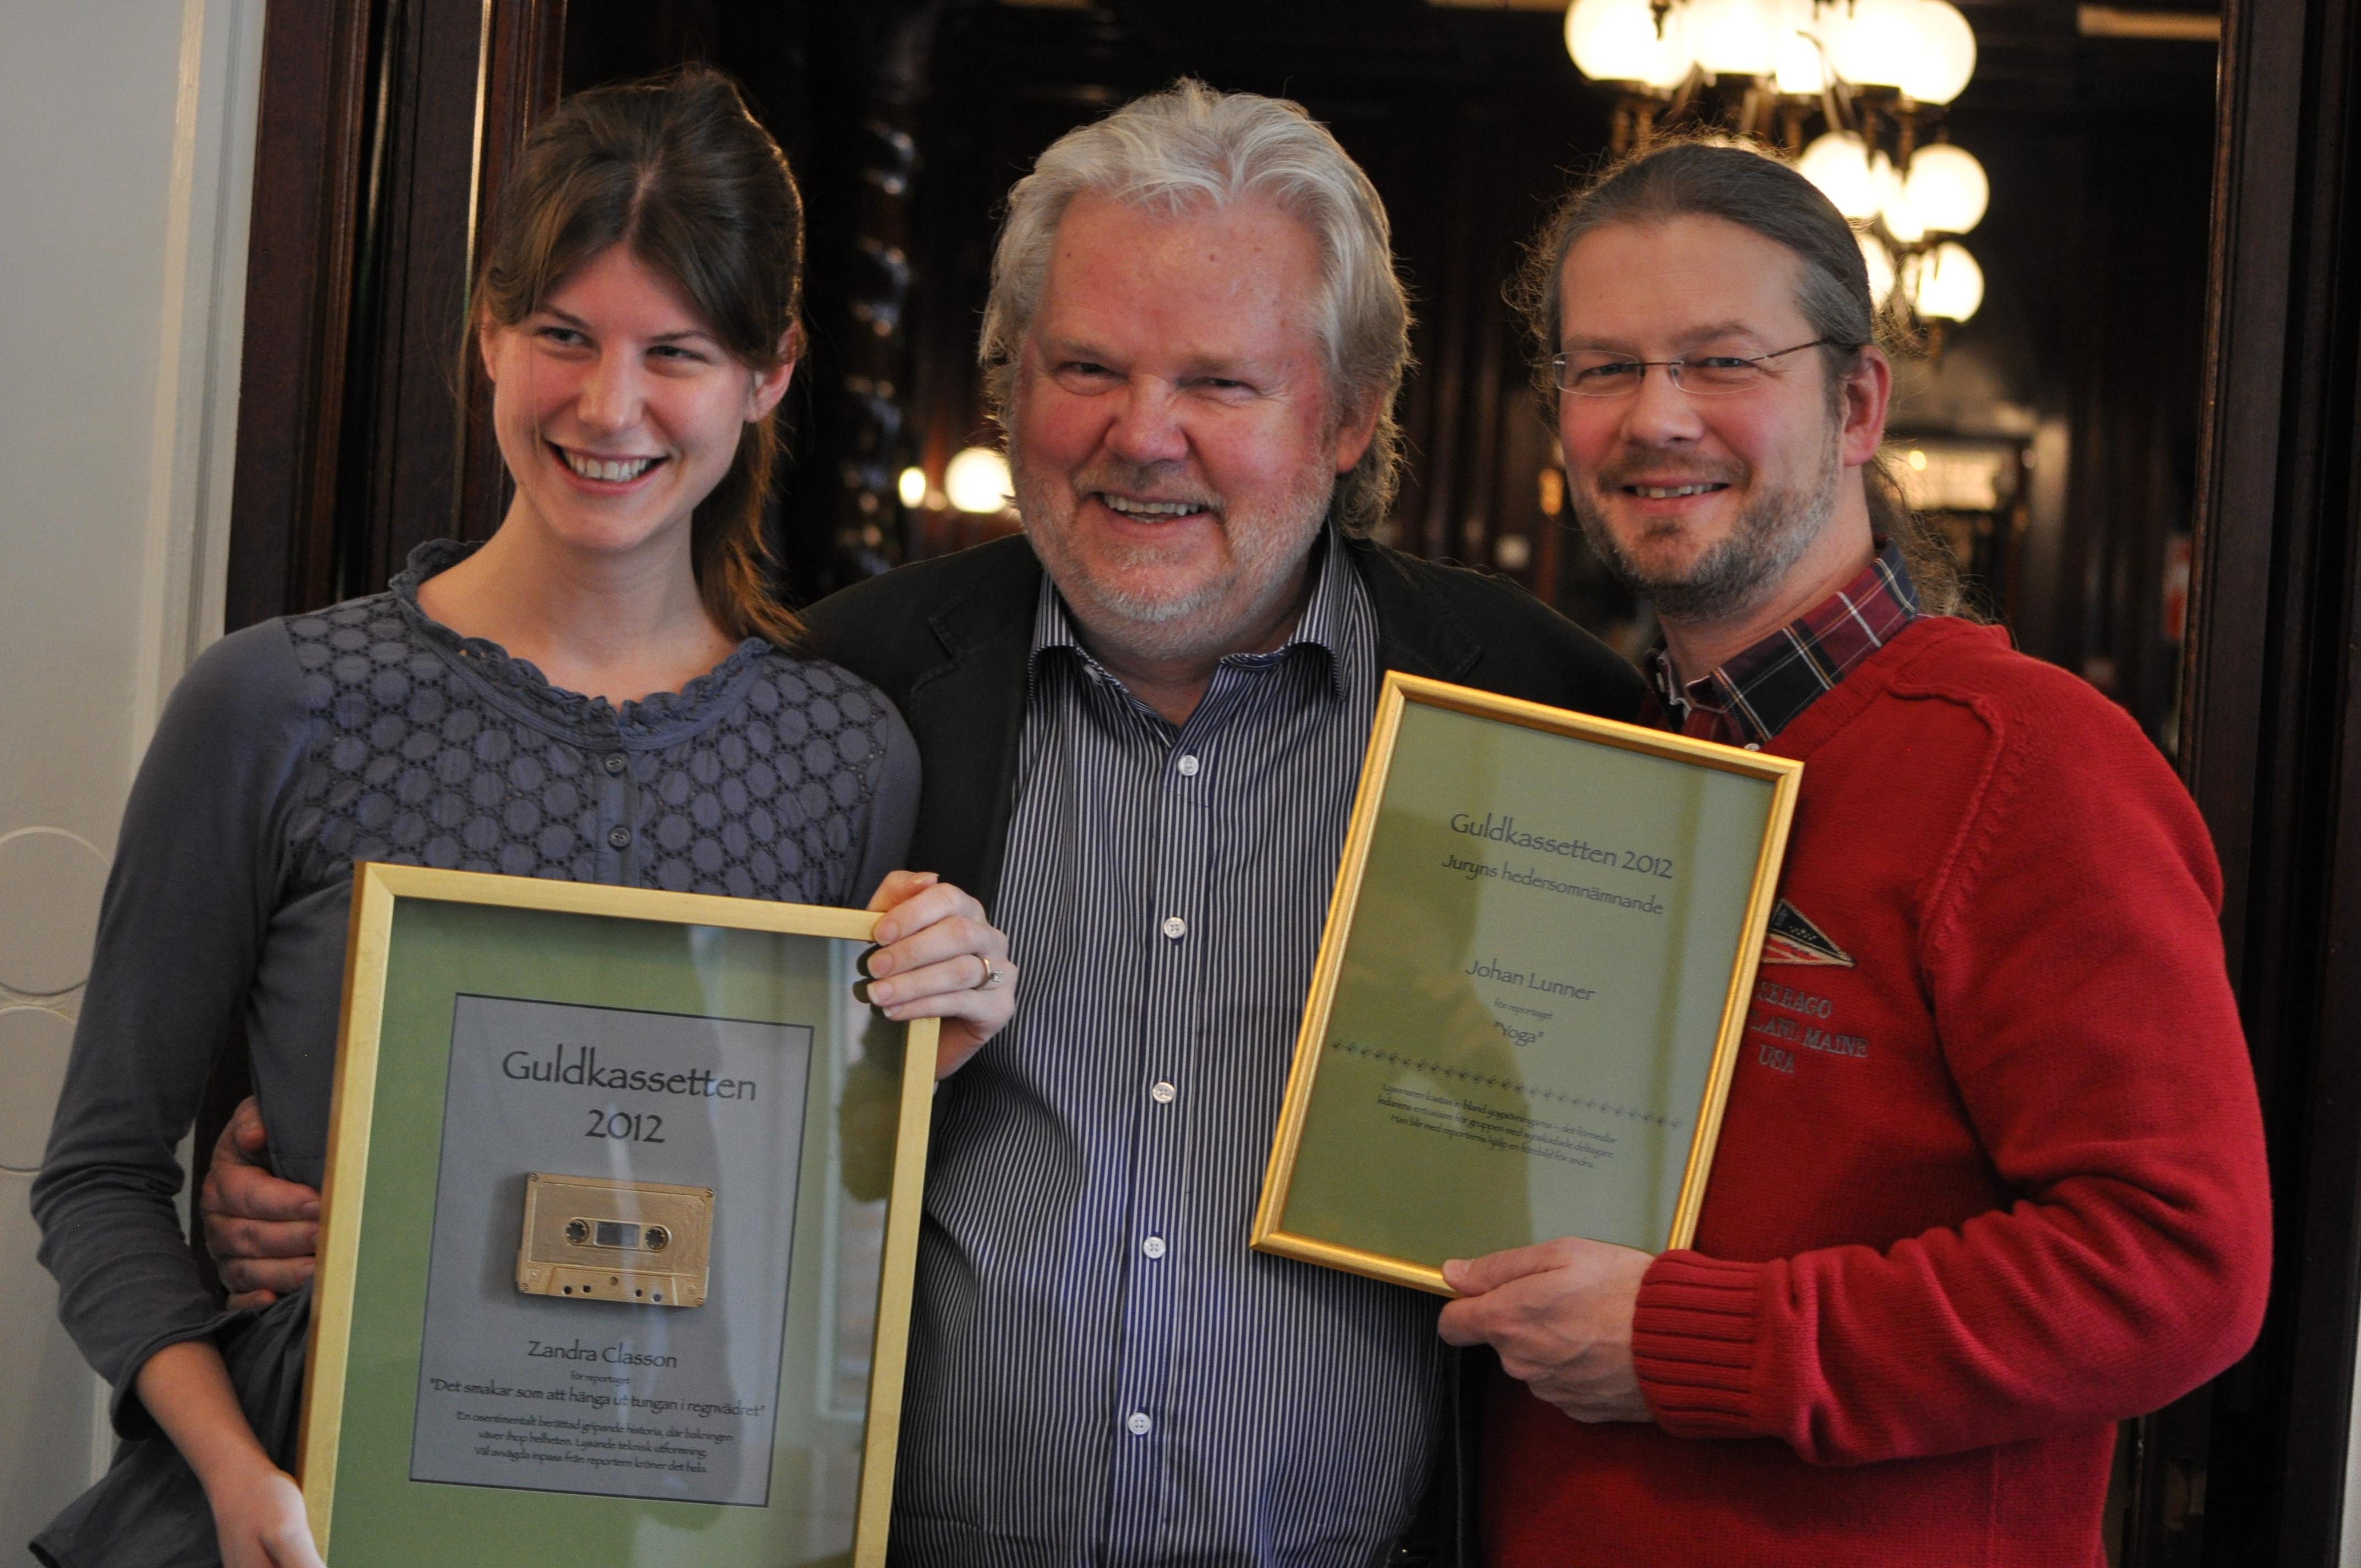 Guldkassettenvinnaren Zandra Classon, prisutdelaren Kjell Albin Abrahamson och hederspristagaren Johan Lunner. Foto: Åsa Nilsson